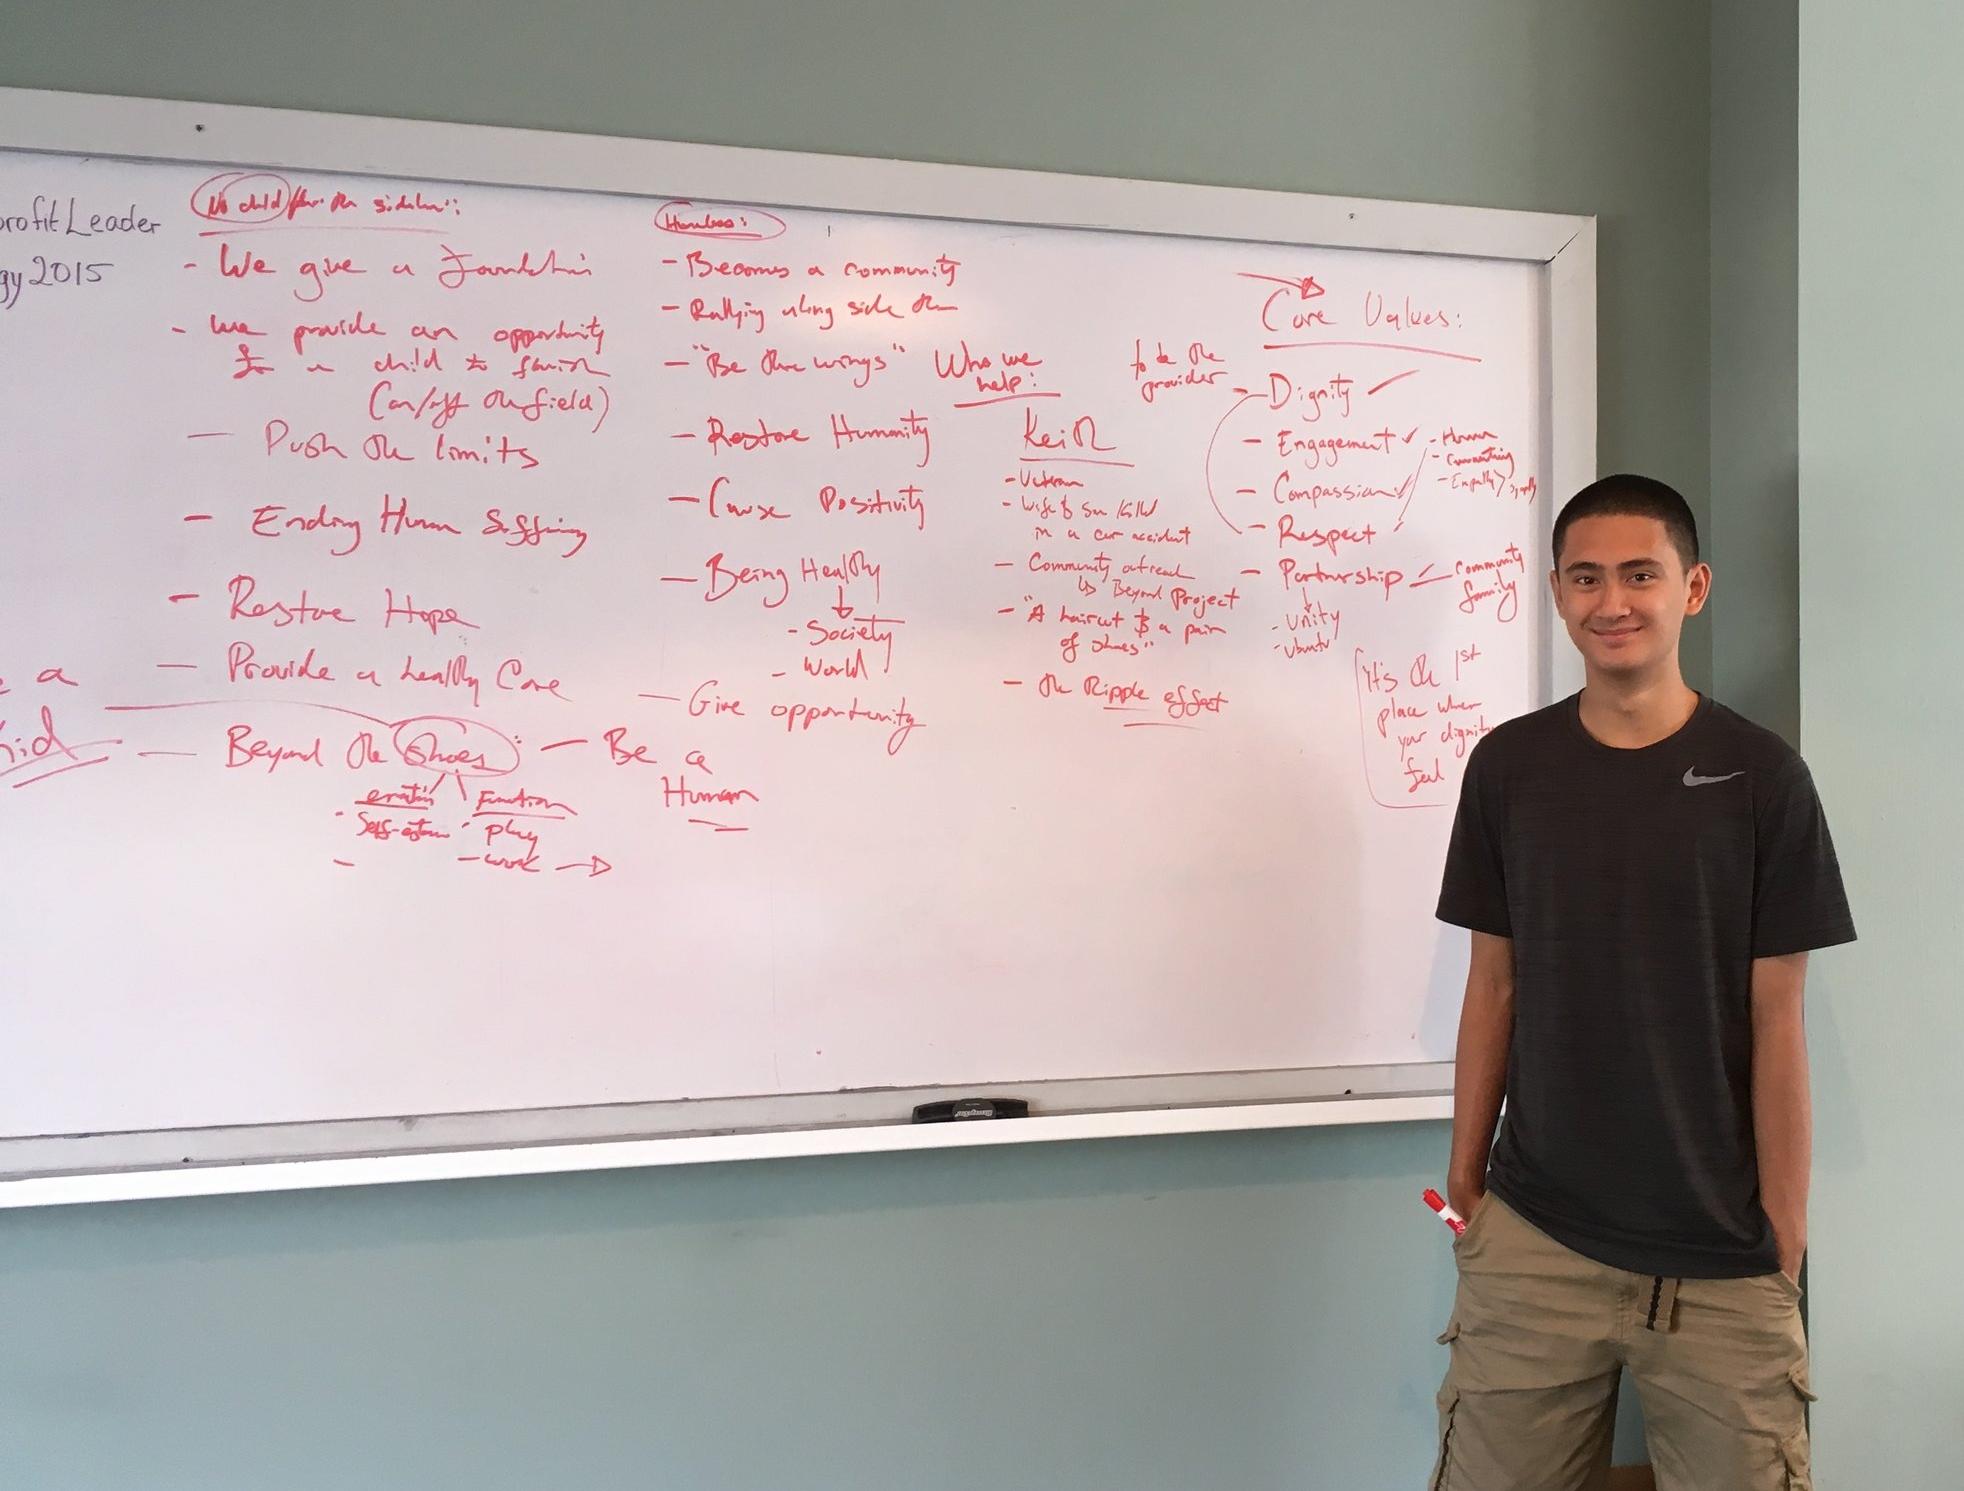 TIPS Intern Tristan, at his YNLO internship